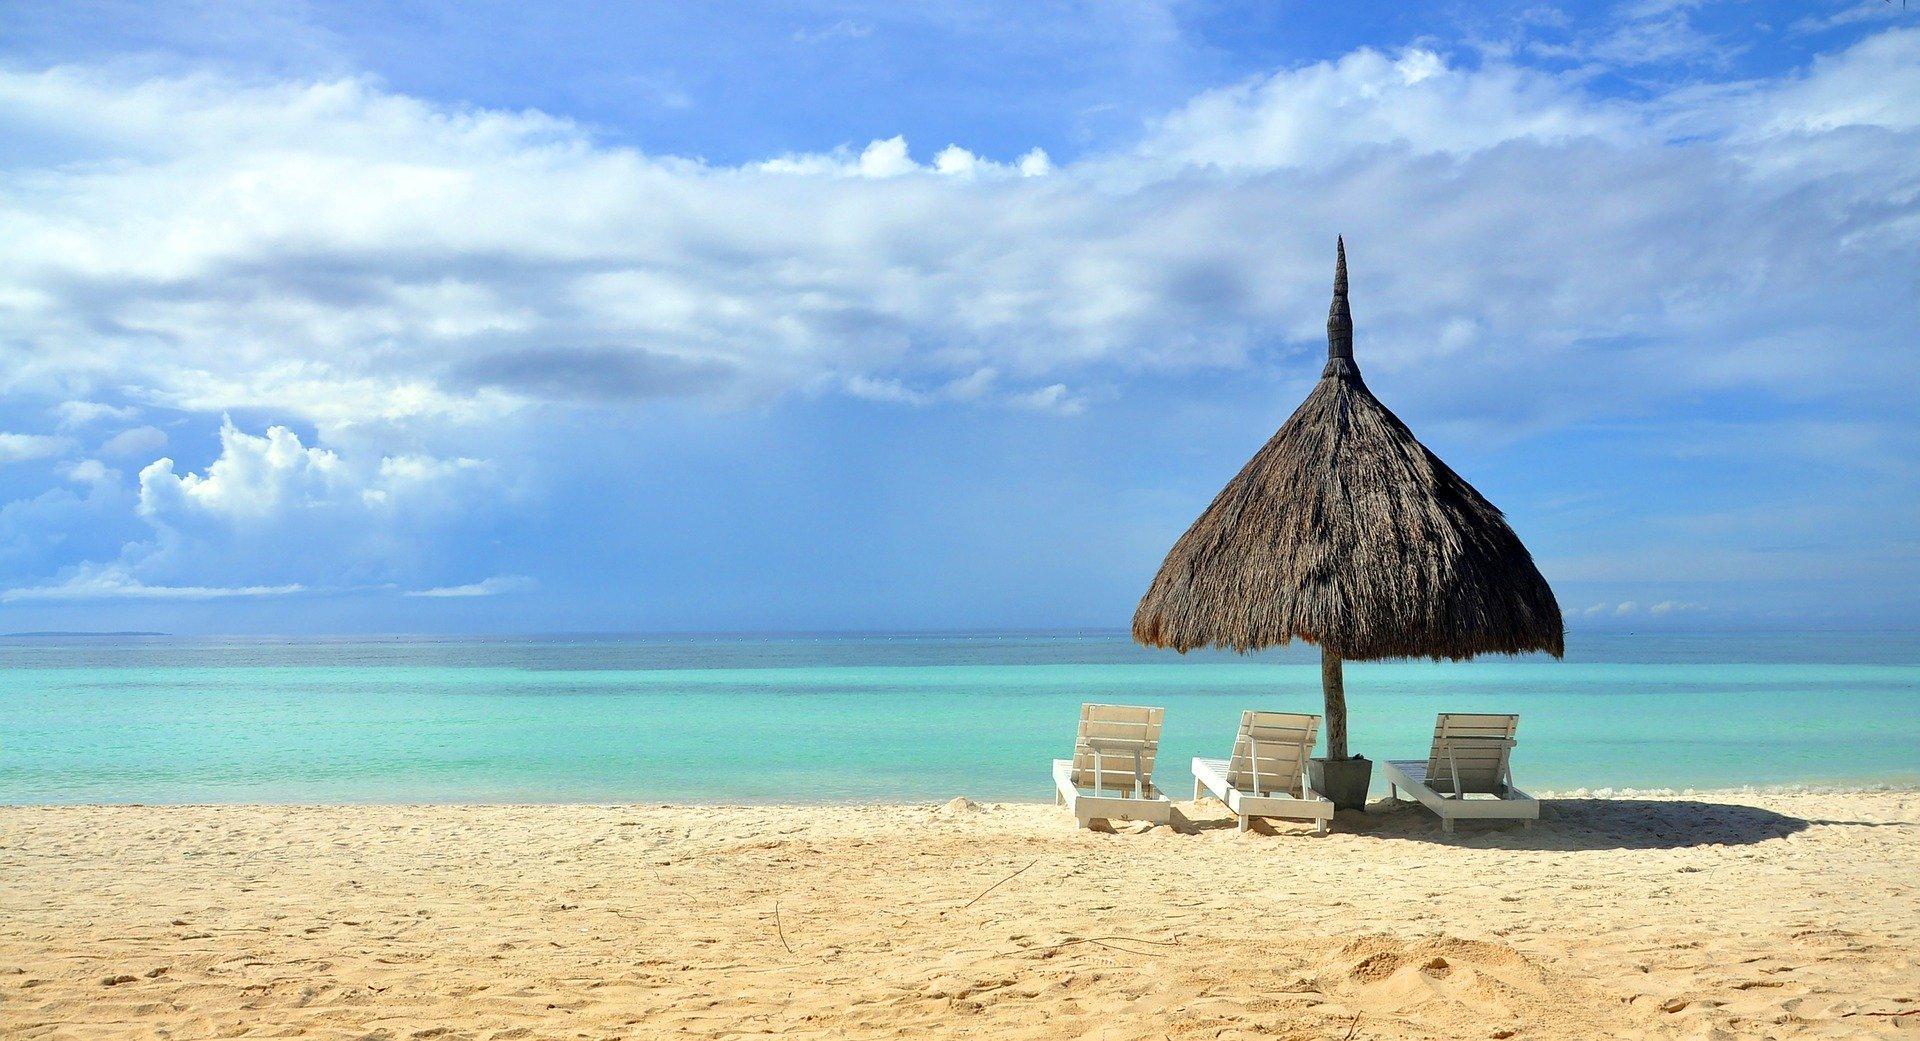 mer plage aux philippines voyage en famille